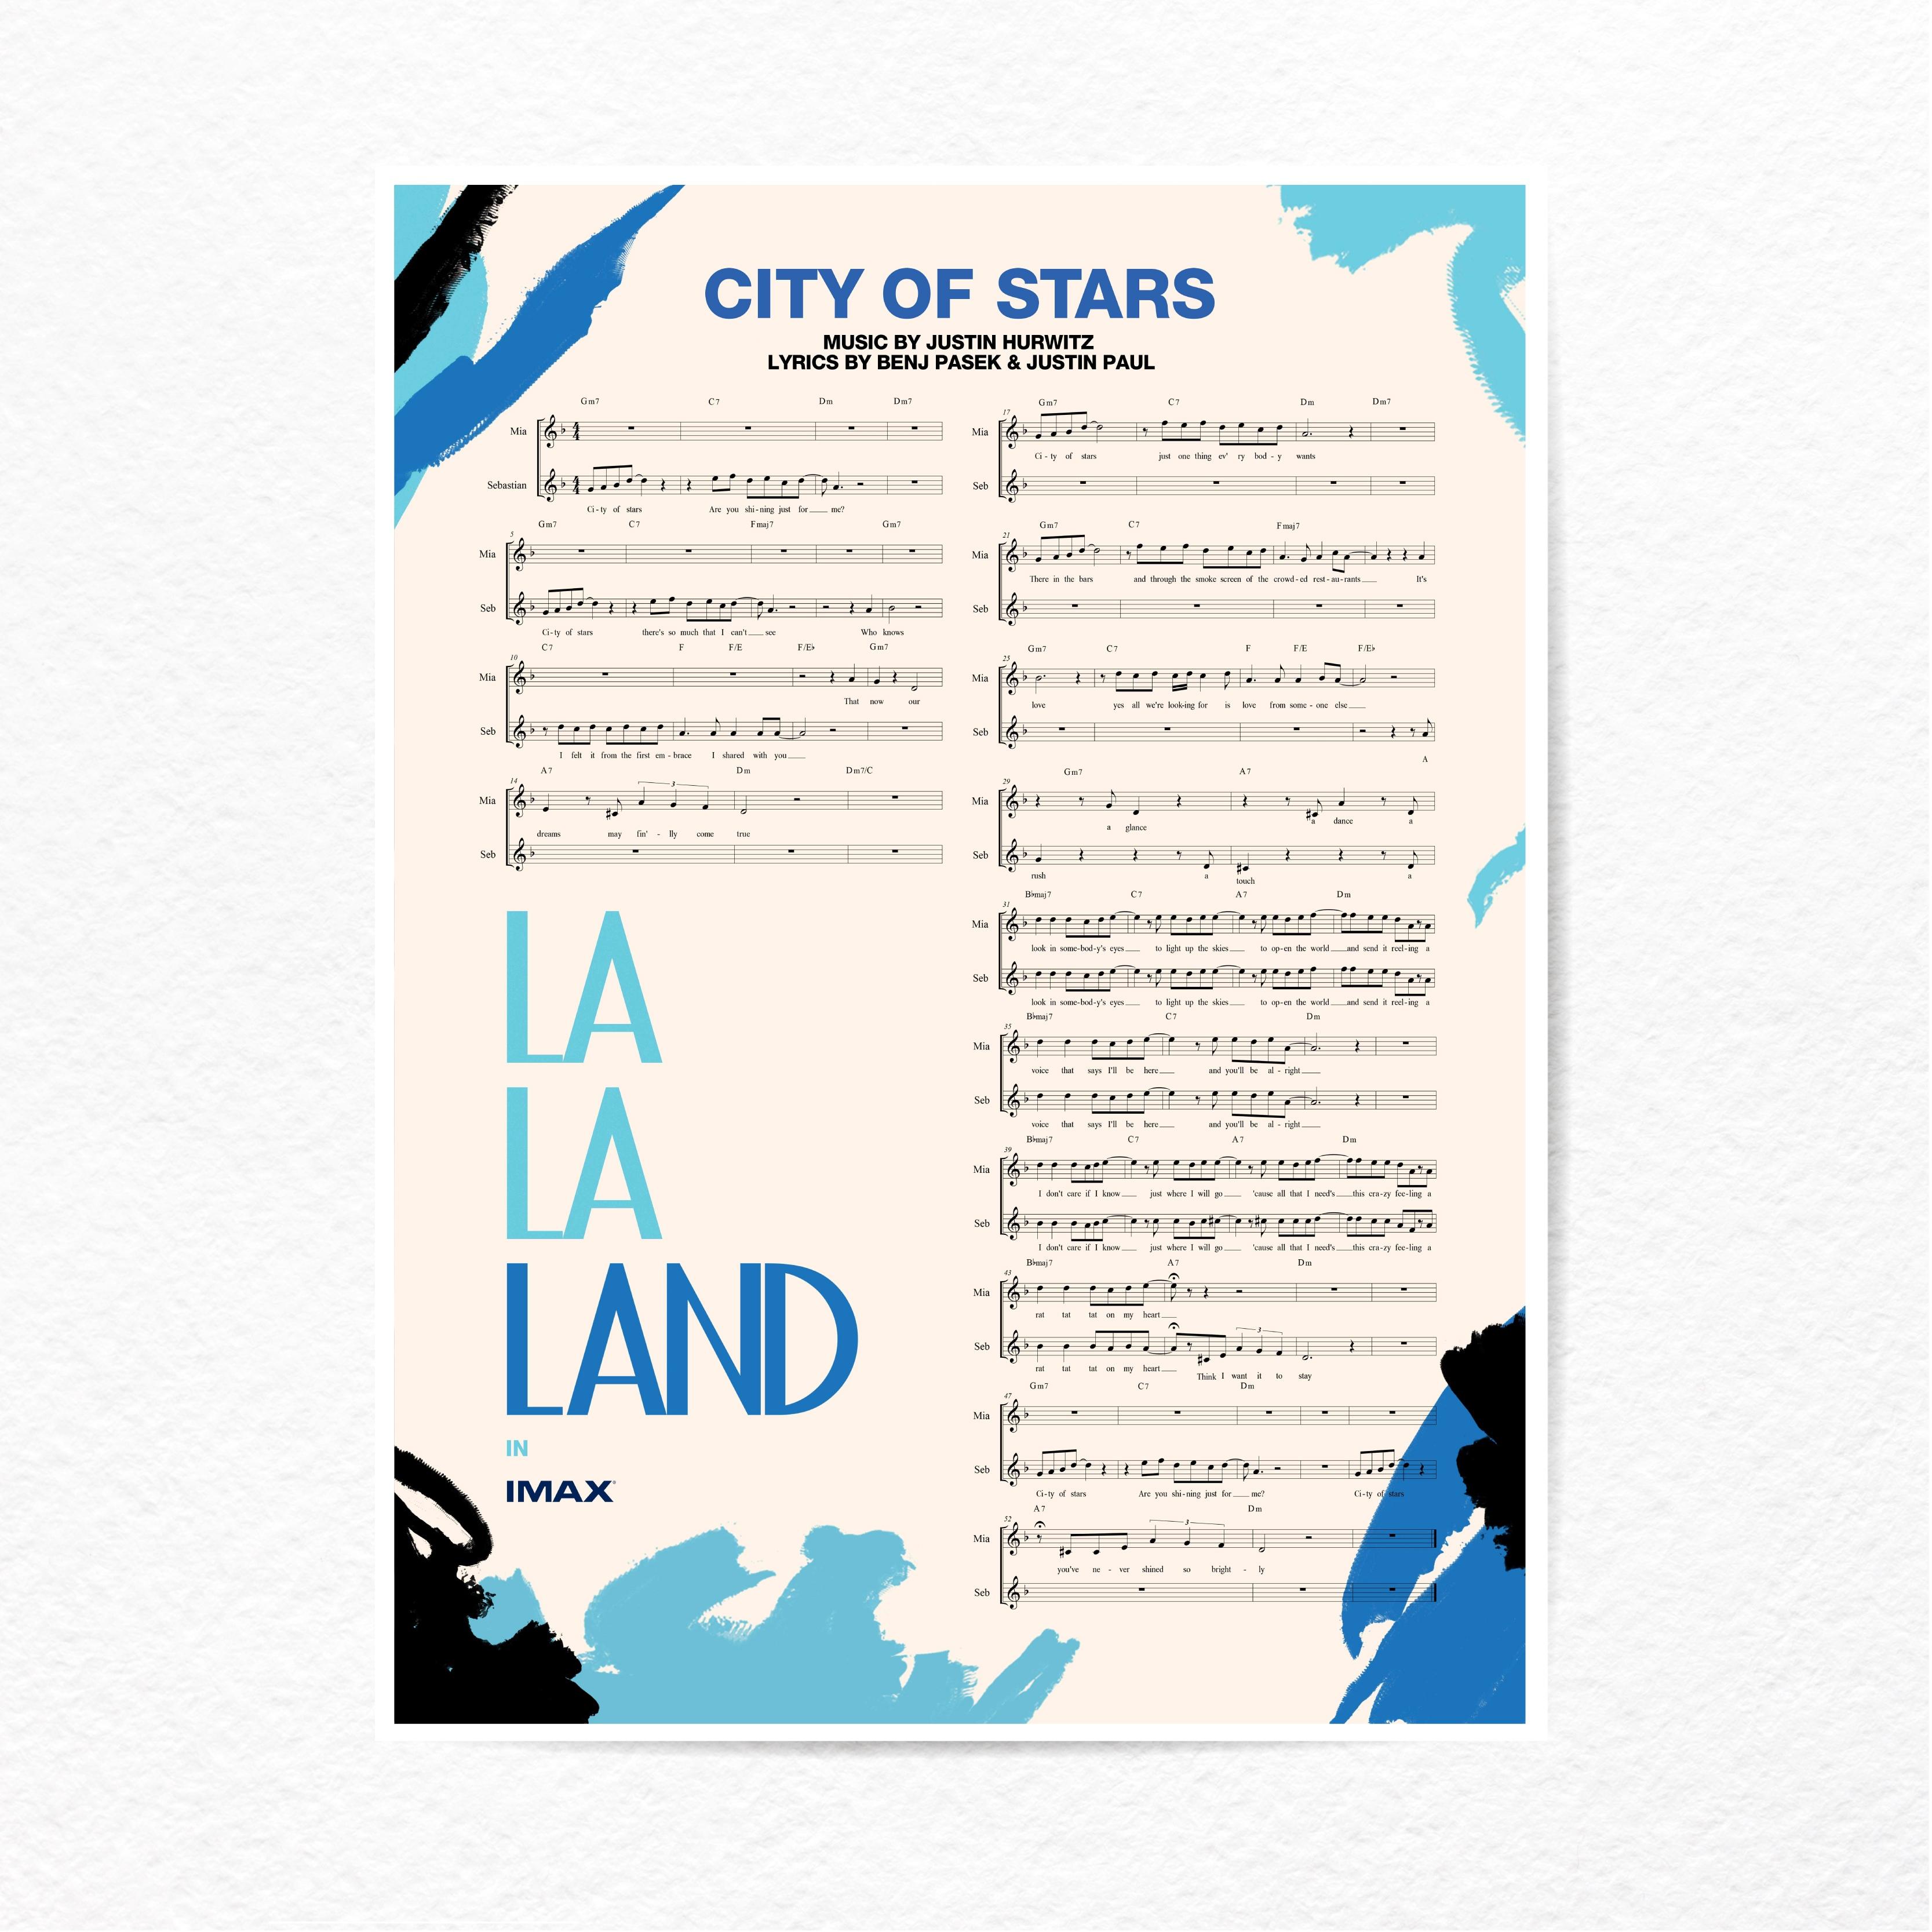 Komorebi/ 小众文艺电影lalaland爱乐之城cityofstars乐谱海报